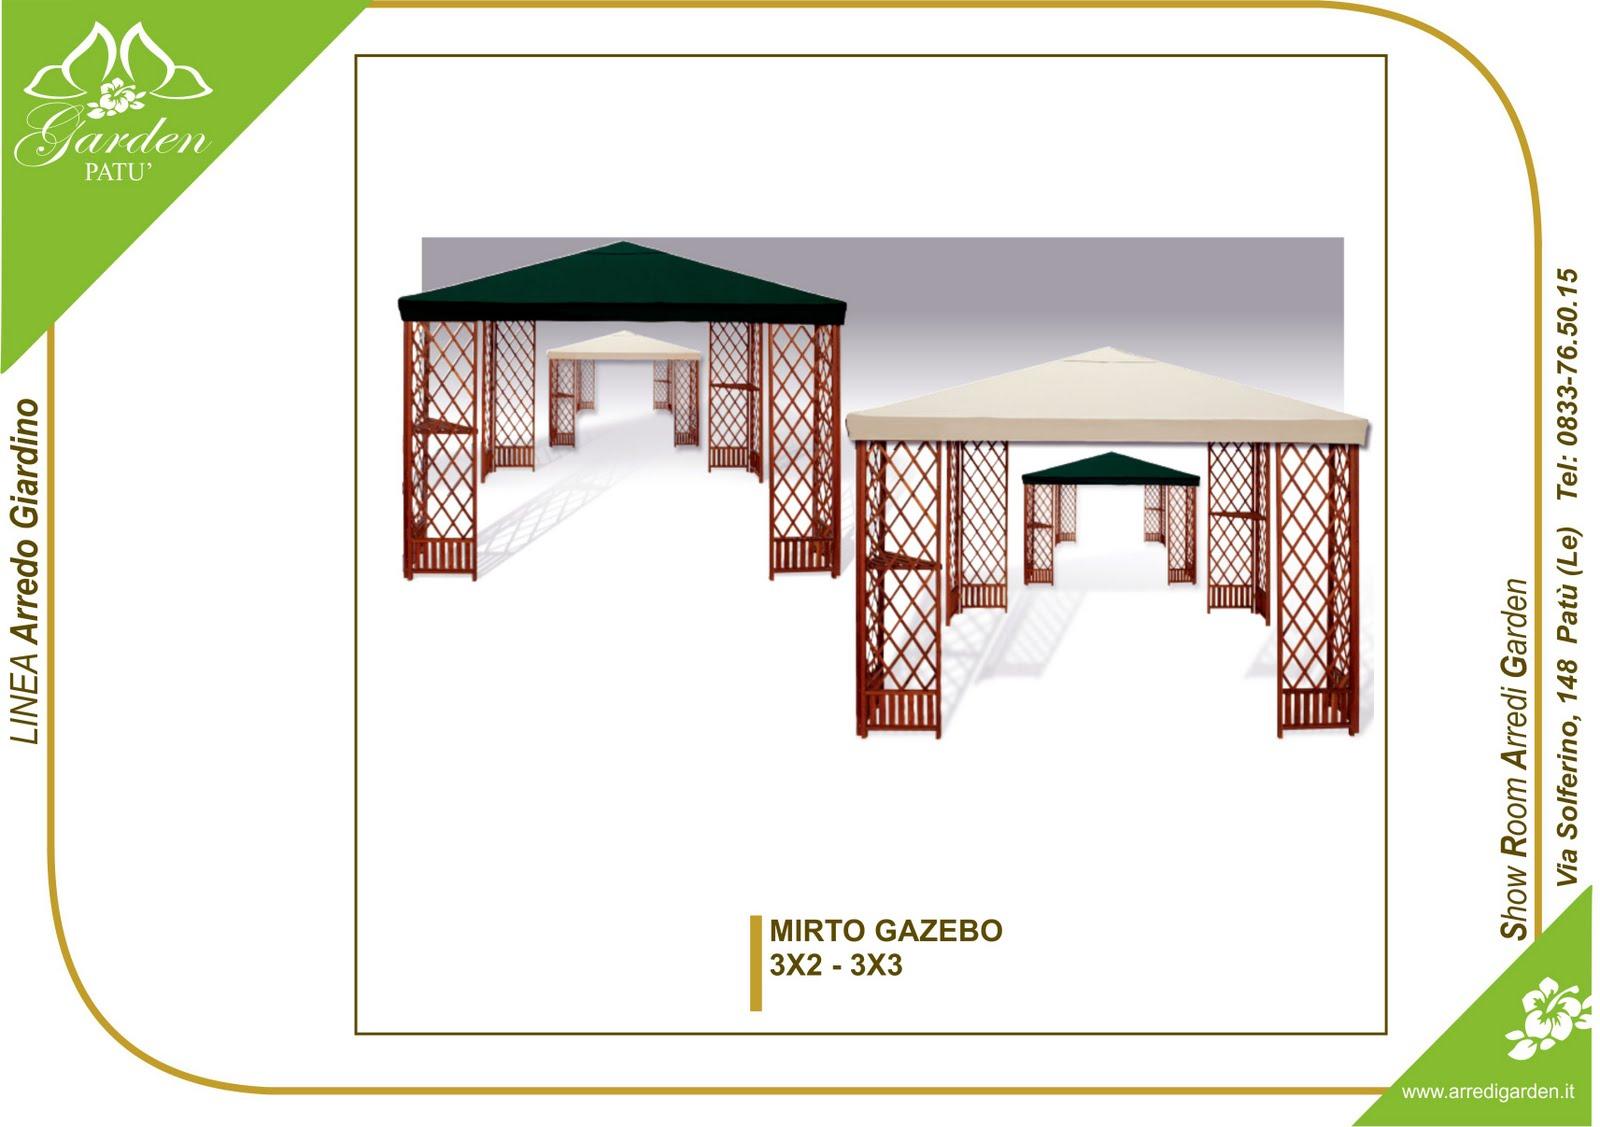 Arredo giardino italia for Arredo giardino lecce